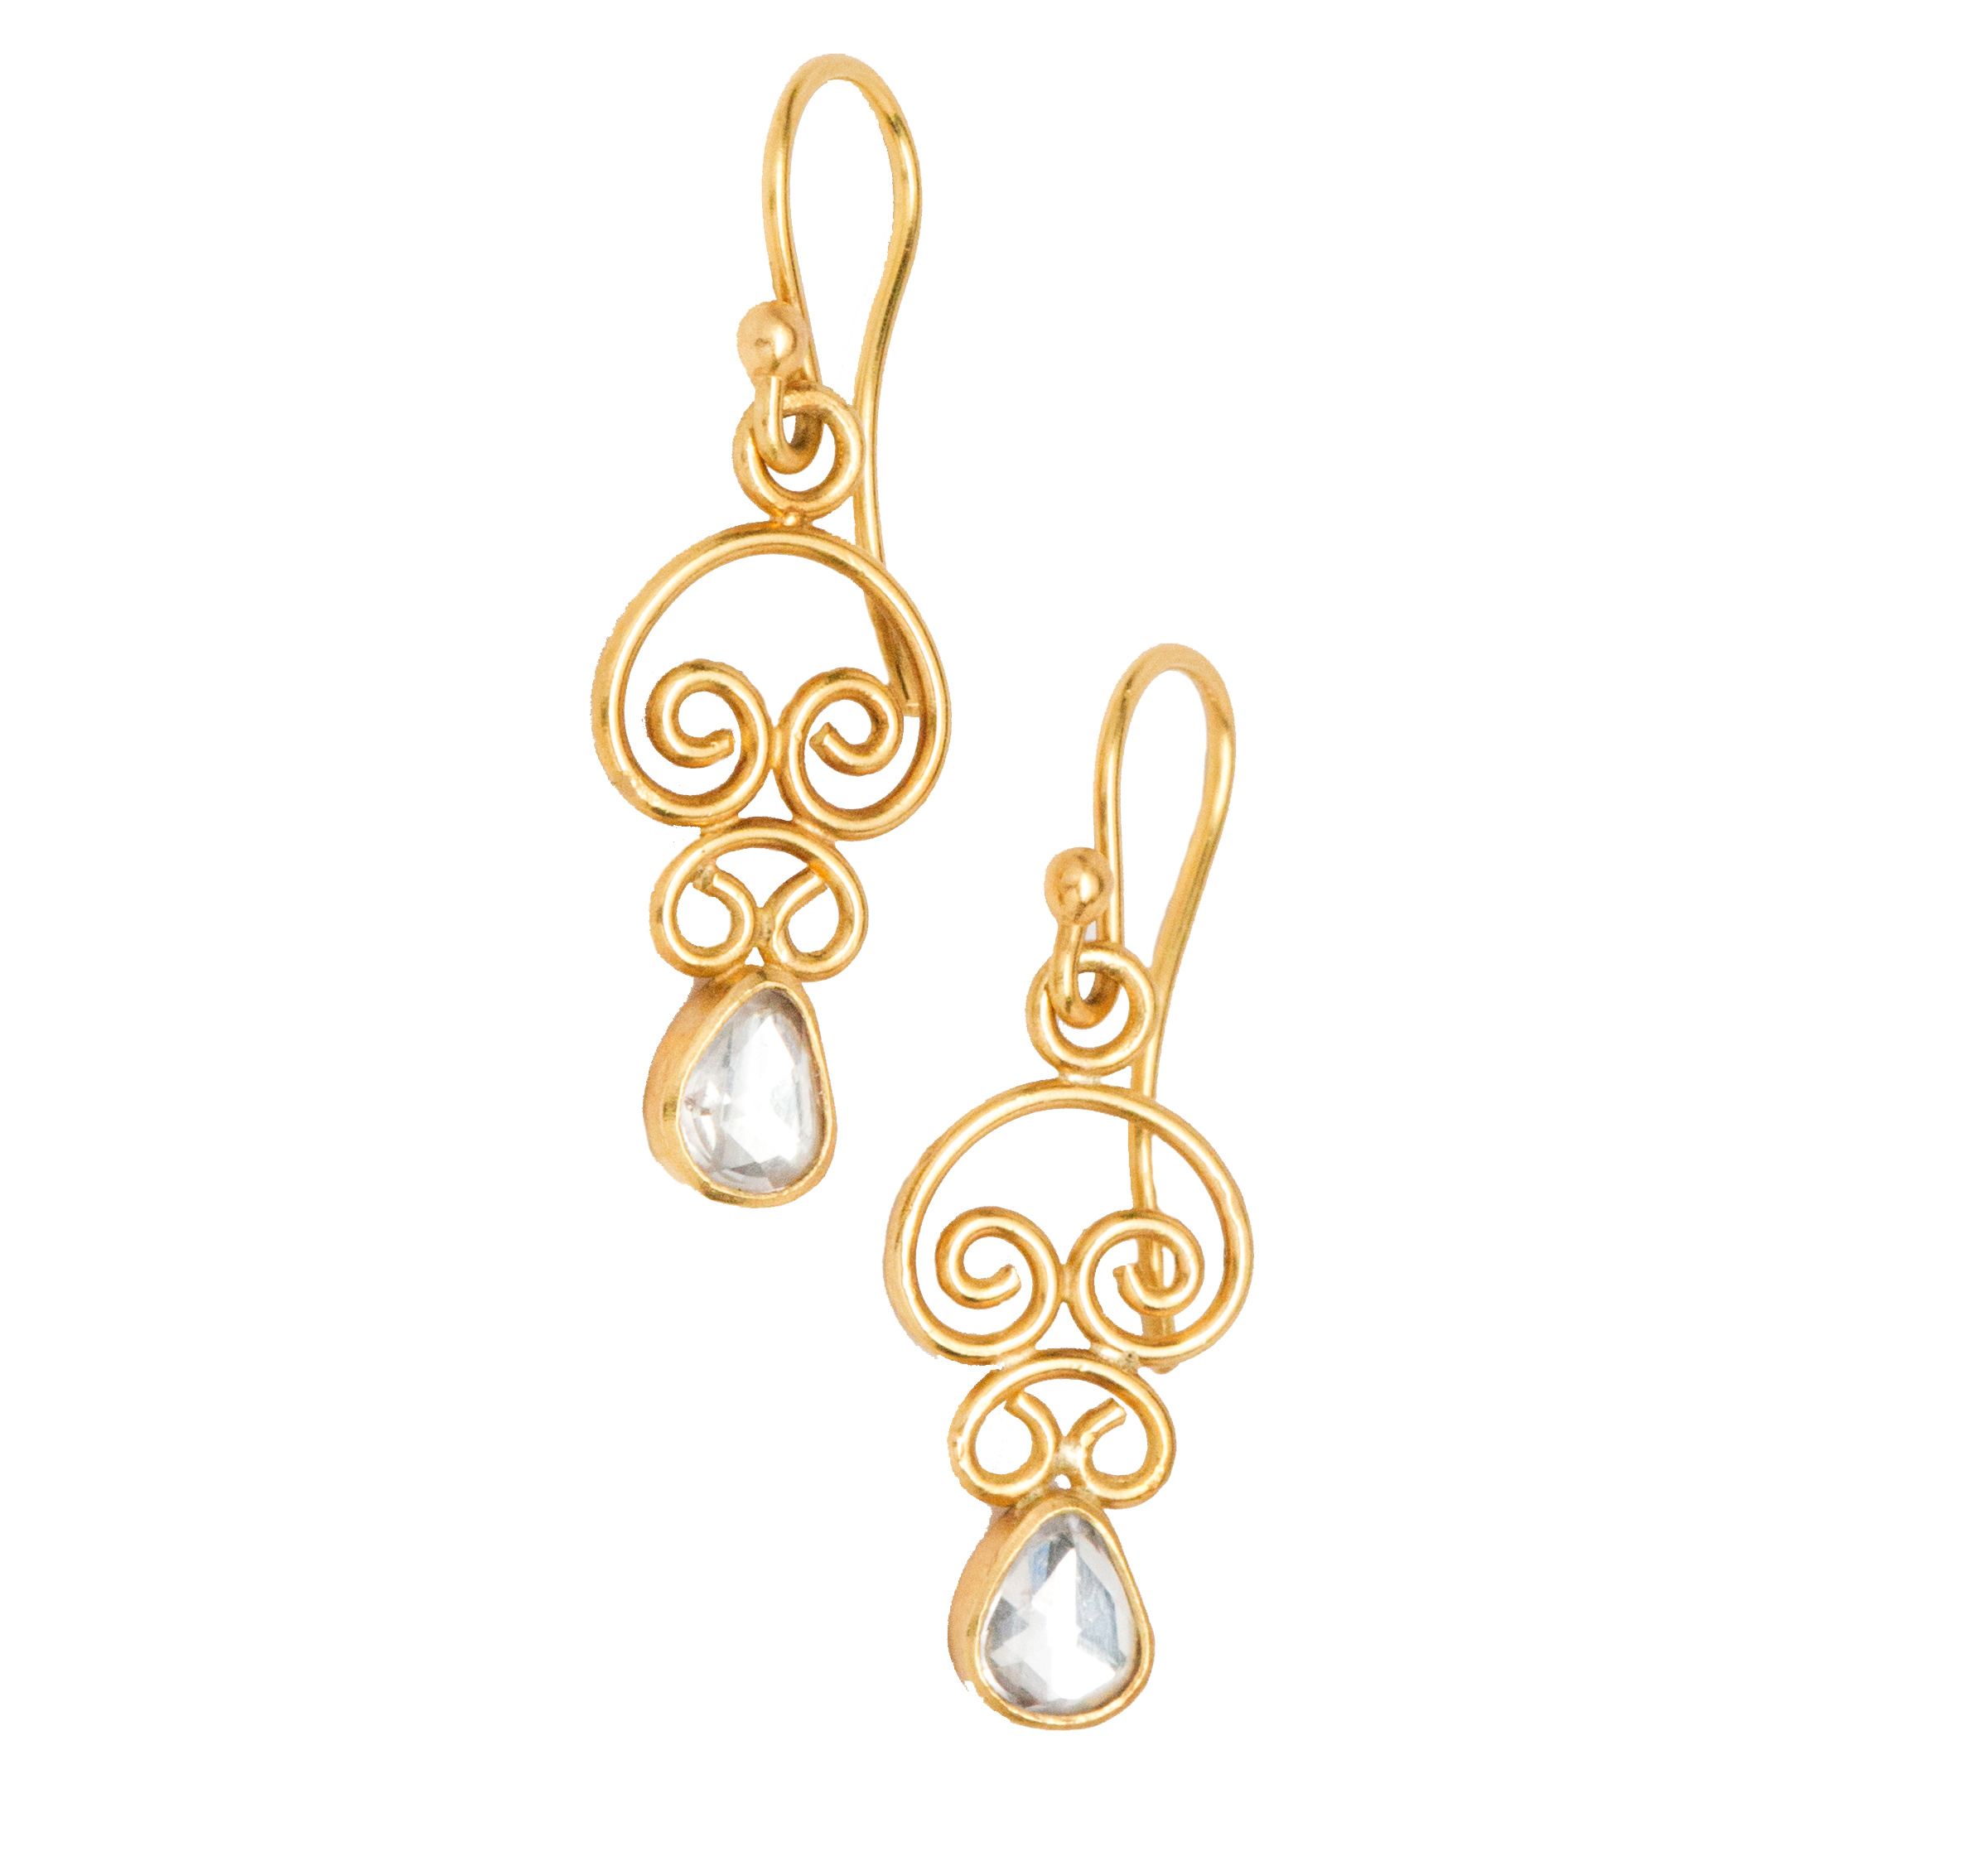 dec19 jewelry2-304.jpg